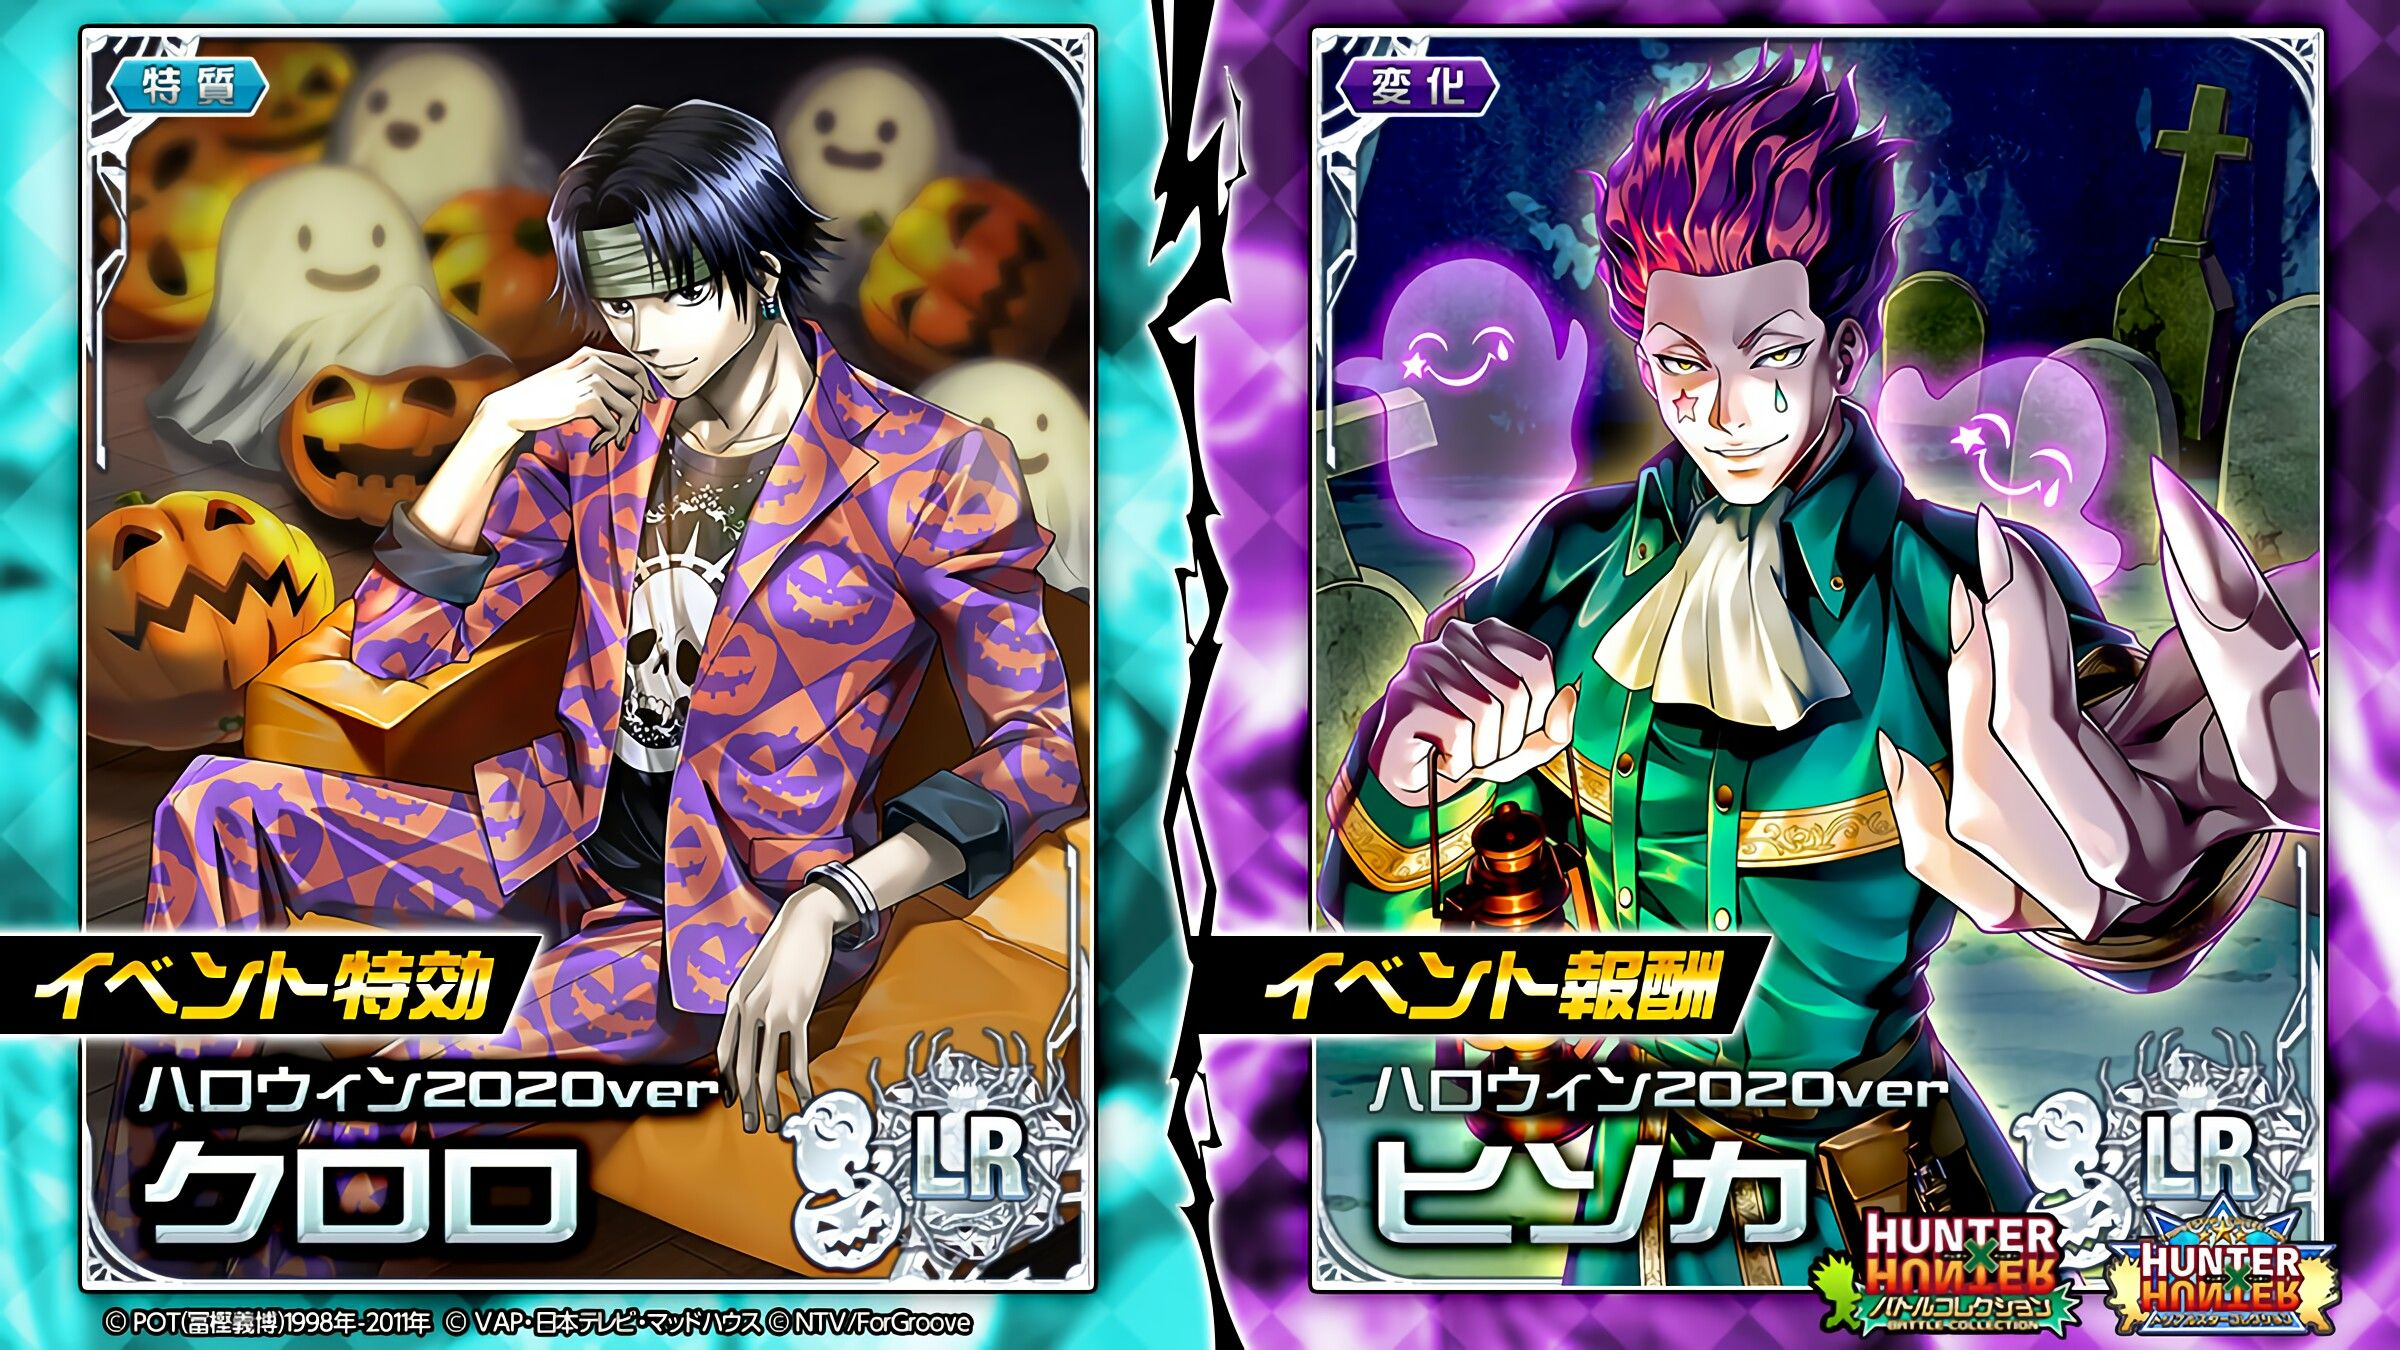 Hunter X Hunter Chrollo And Hisoka Halloween 2020 Hxh Mobage Cards ハロウィン2020ver Hunter X Hunter Comic Book Cover Anime